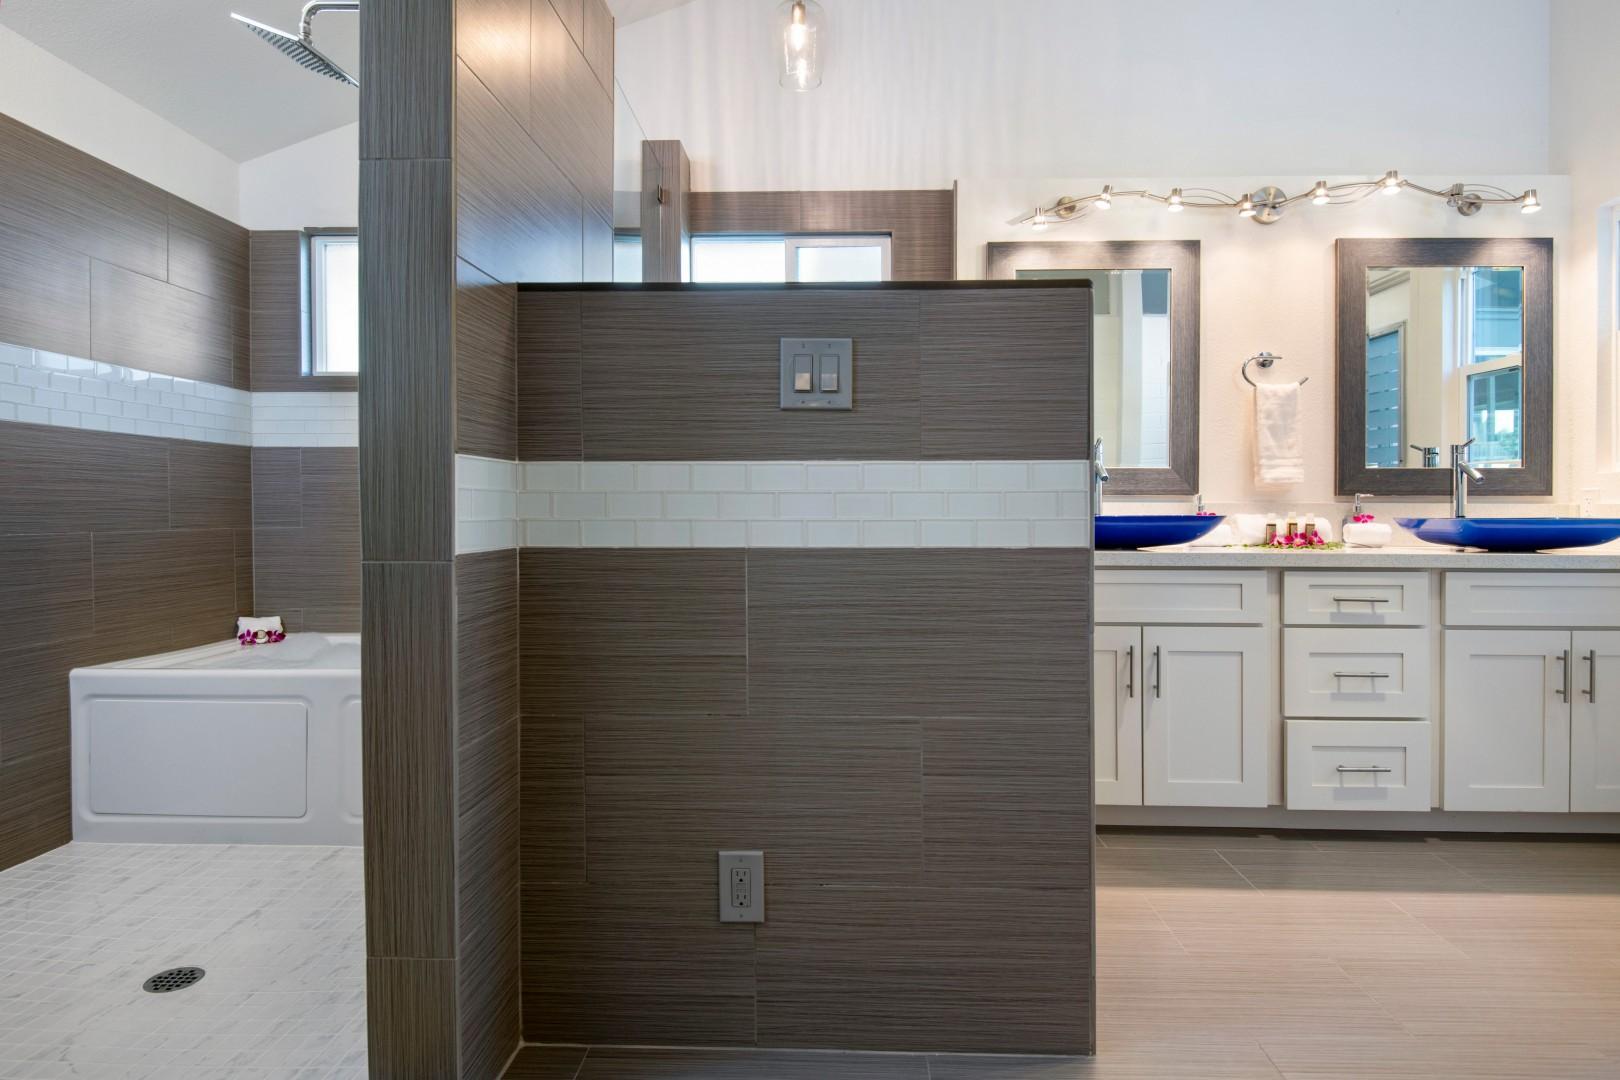 Master en-suite bathroom view. Walk in shower and bath, private toilet nook.